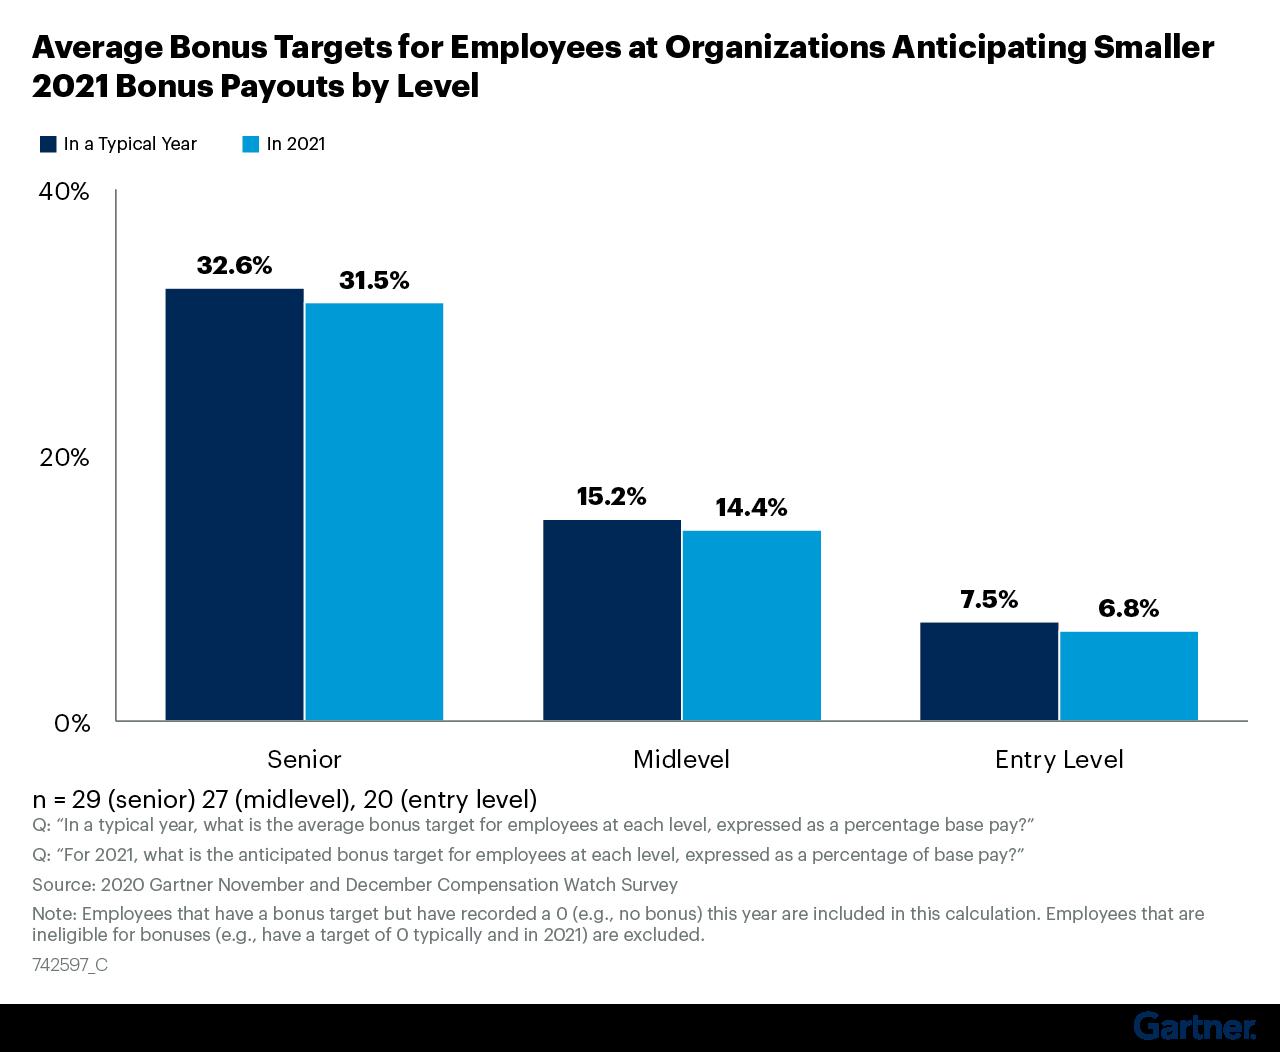 Figure 13: Average Bonus Targets for Employees at Organizations Anticipating Smaller 2021 Bonus Payouts by Level